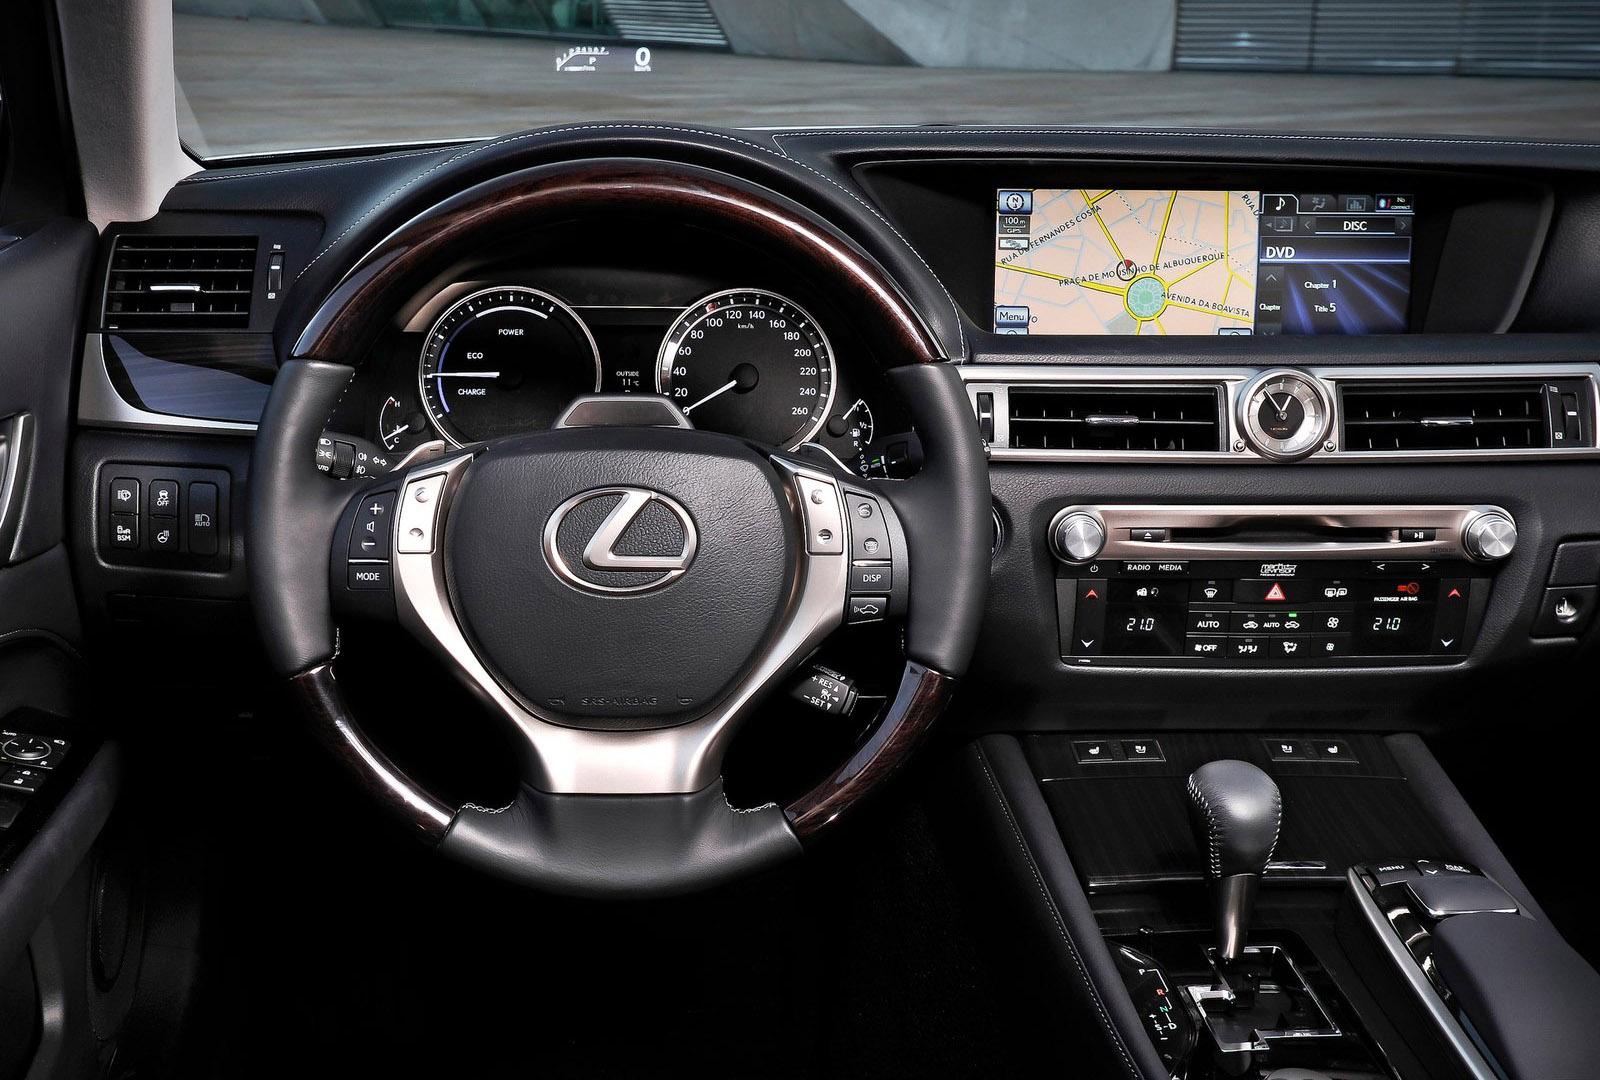 https://www.automobilesreview.com/gallery/2013-lexus-gs-450h-hybrid/2013-lexus-gs-450h-hybrid-36.jpg